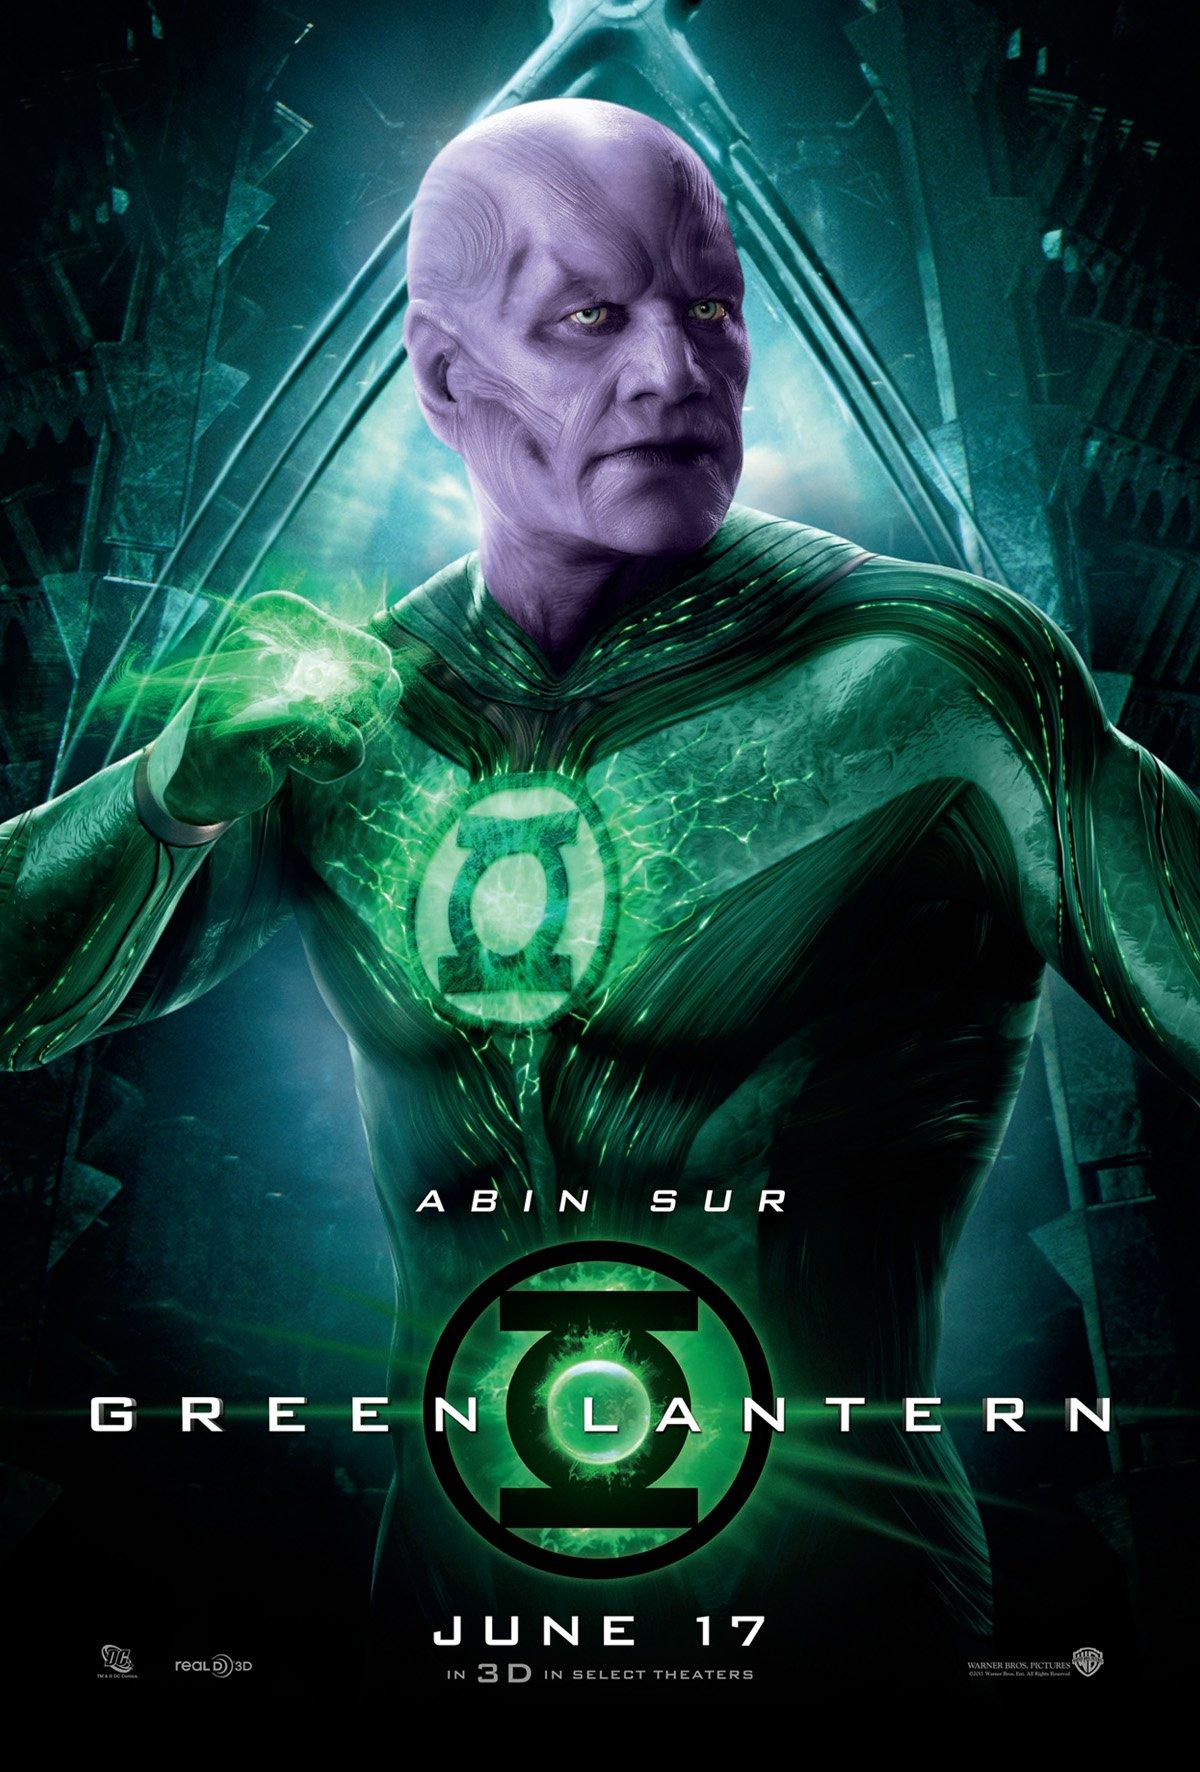 Green Lantern (2011) poster - FreeMoviePosters.net Green Lantern Movie Poster